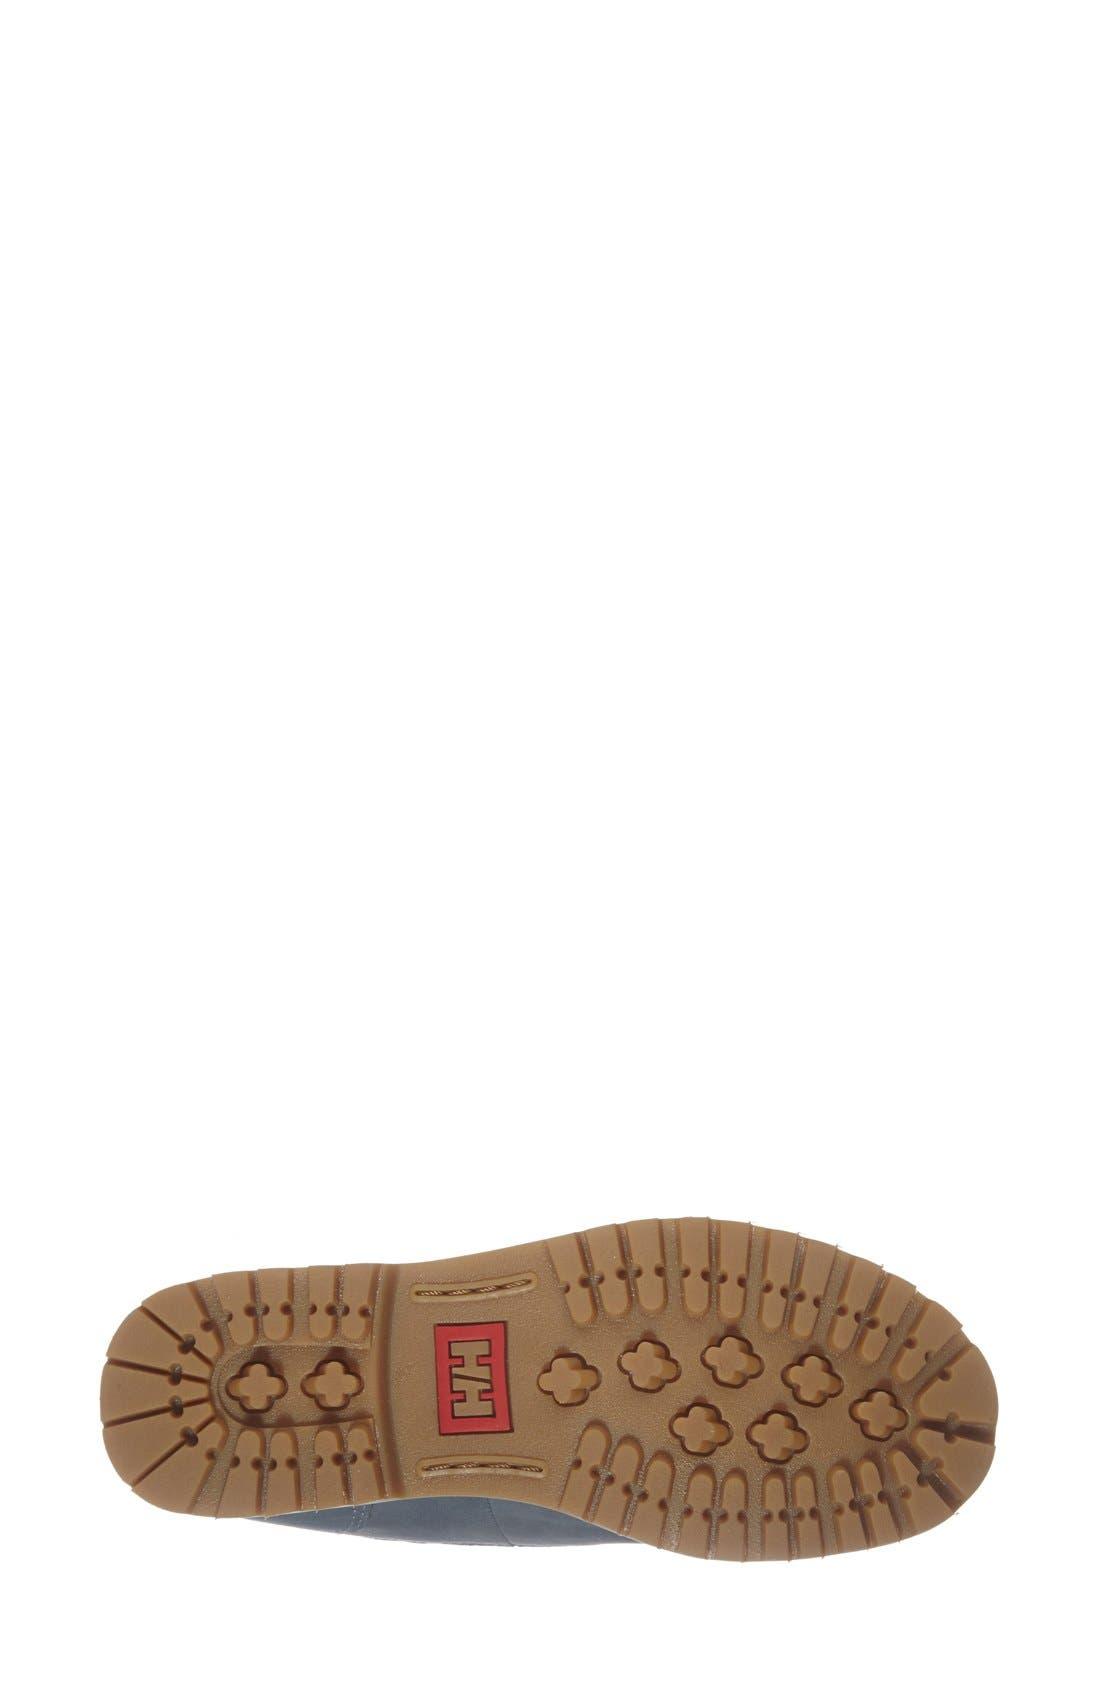 'Vega' Waterproof Leather Boot,                             Alternate thumbnail 4, color,                             400